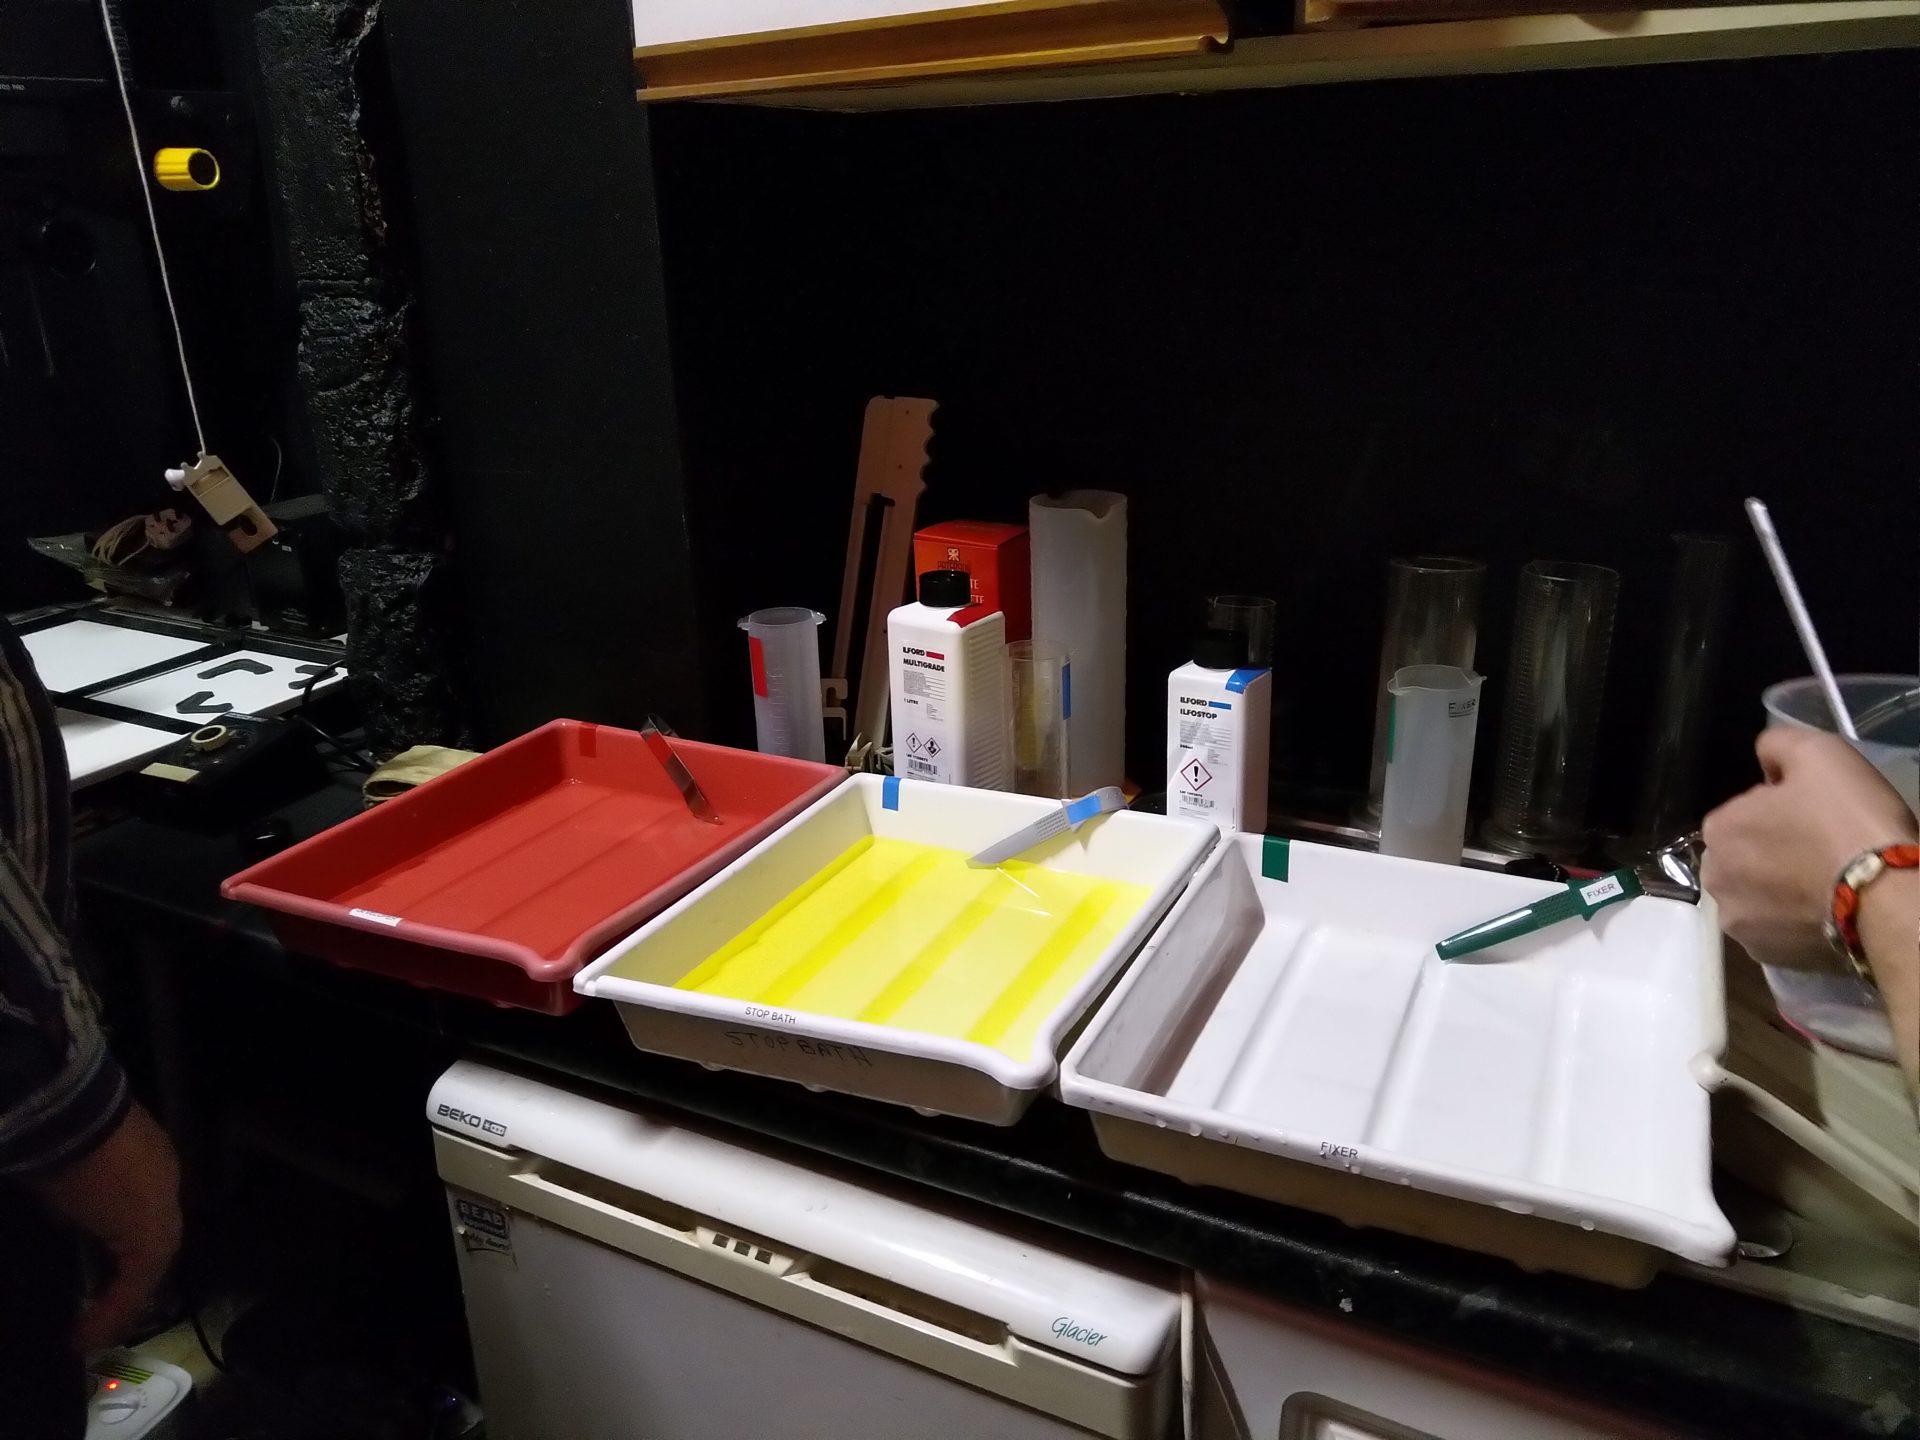 Darkroom development trays